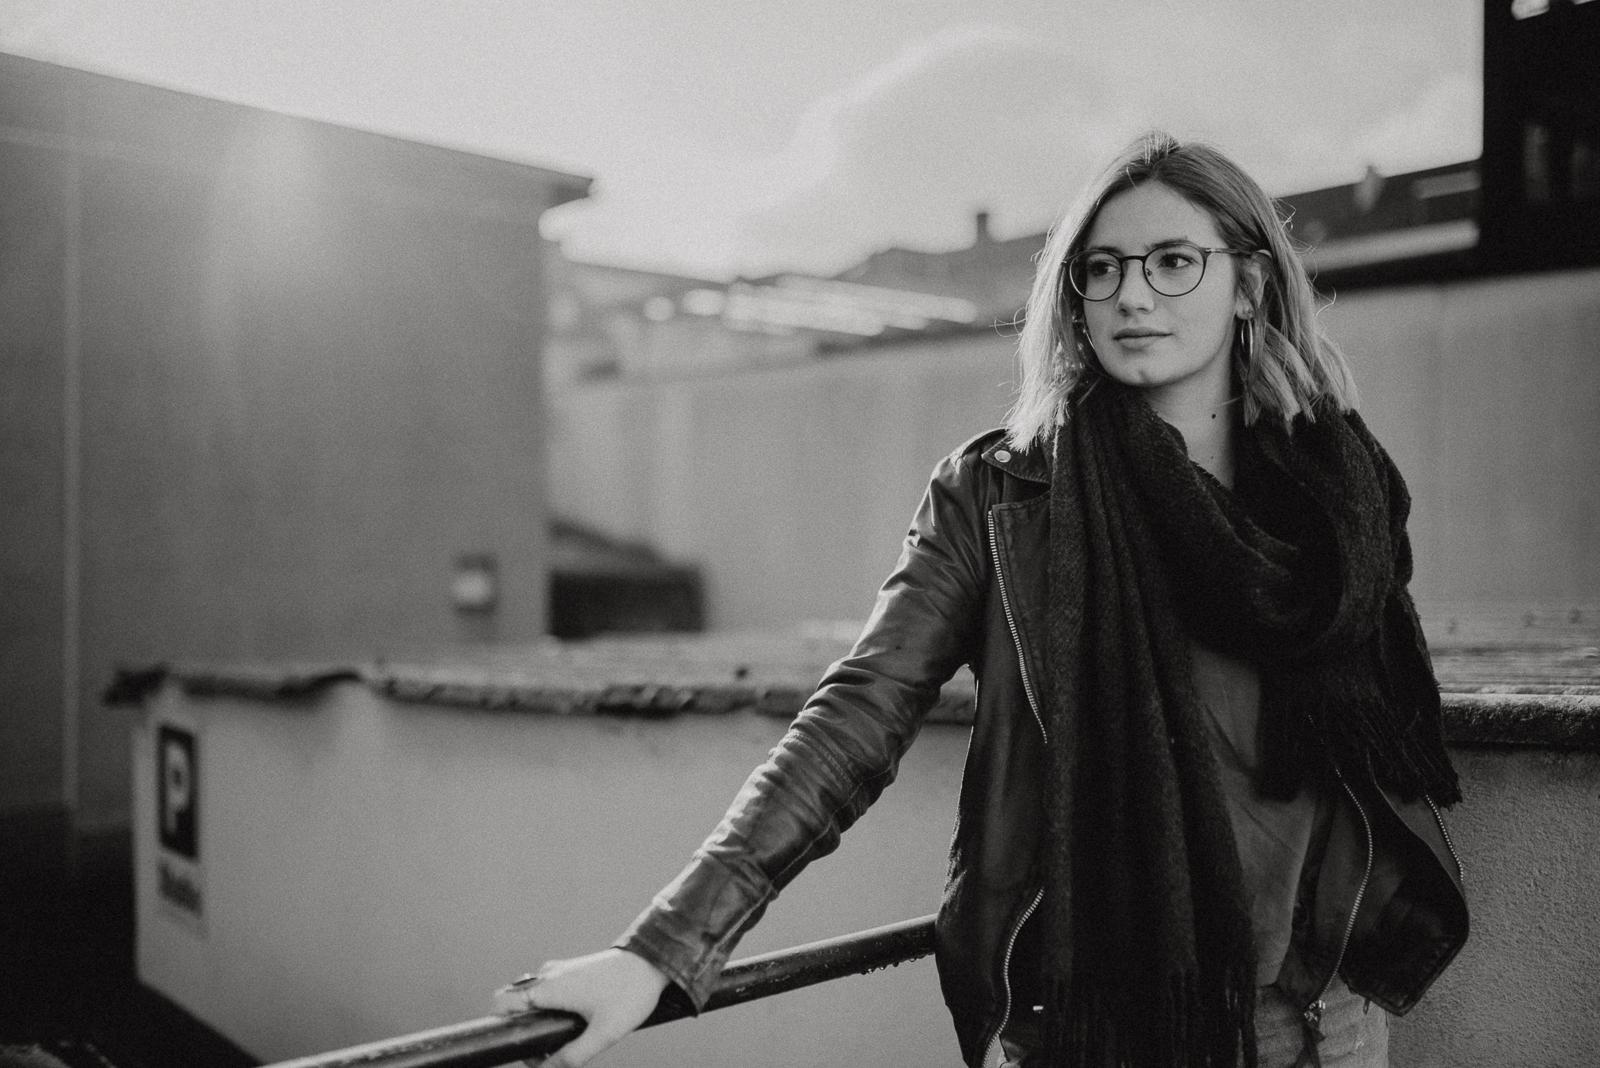 003-designparaplus-fotografin-witten-portrait-shooting-downtown